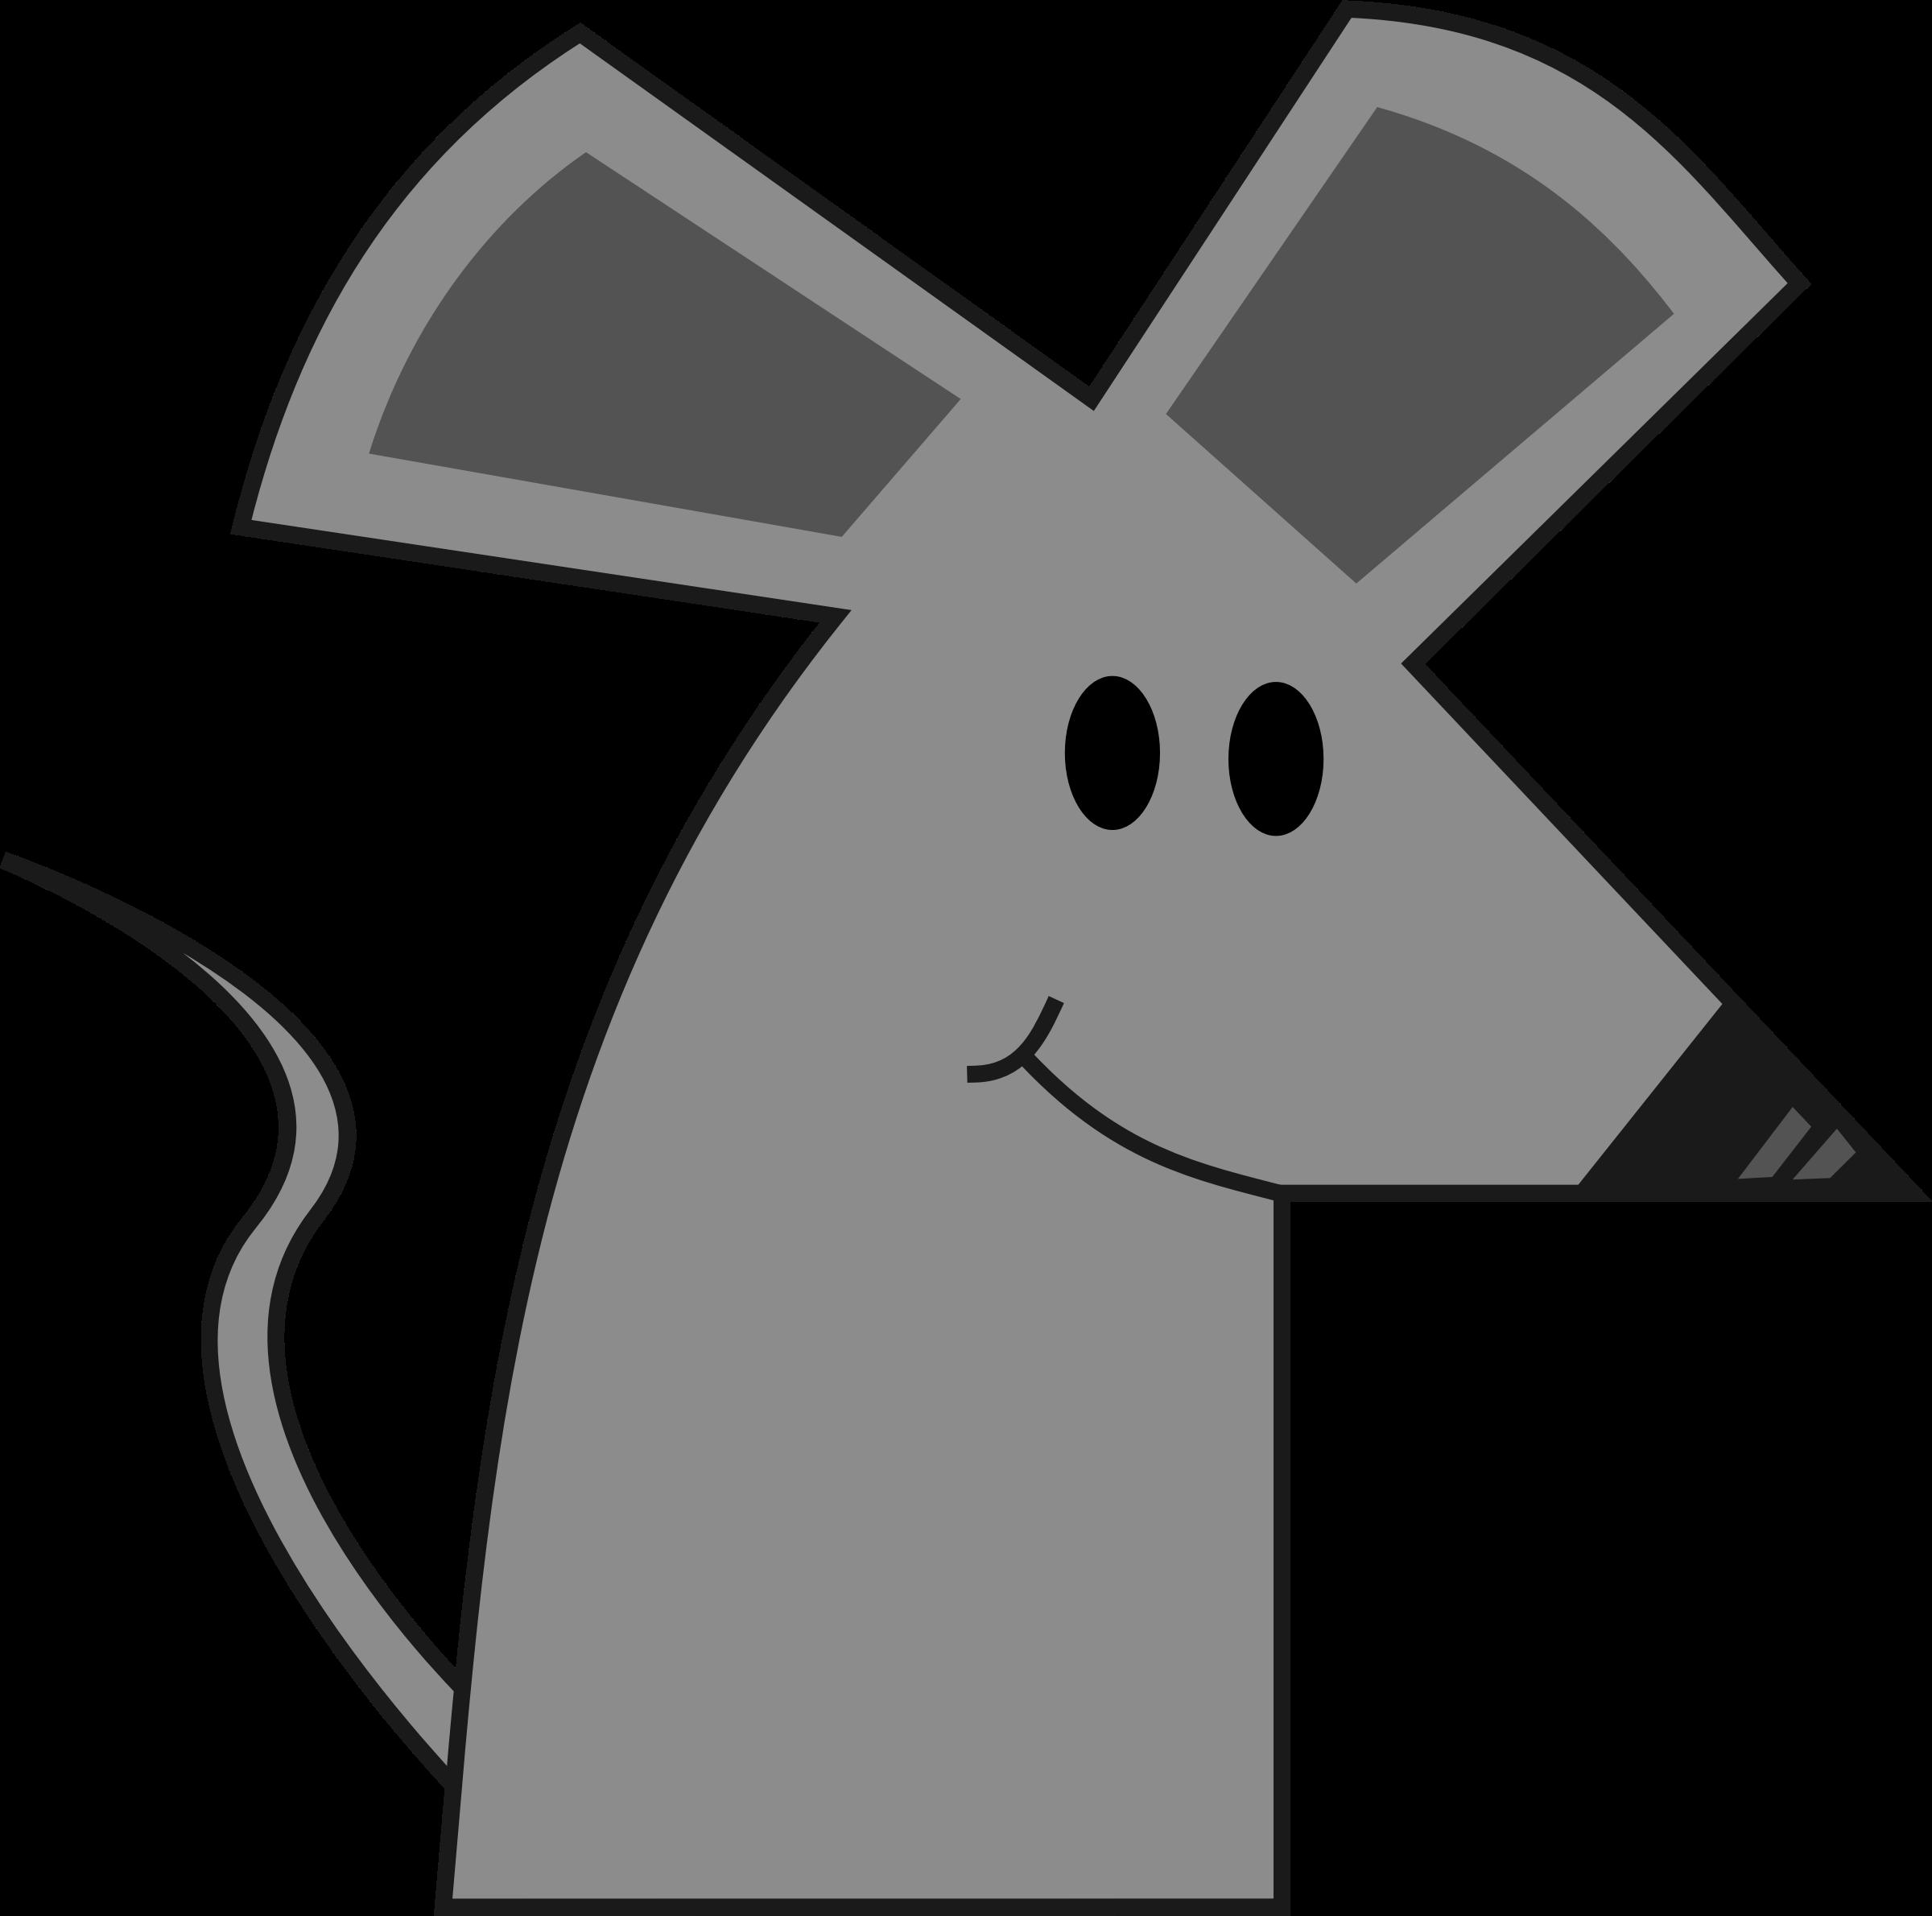 Cute clipartblack com animal. Clipart mouse gray mouse